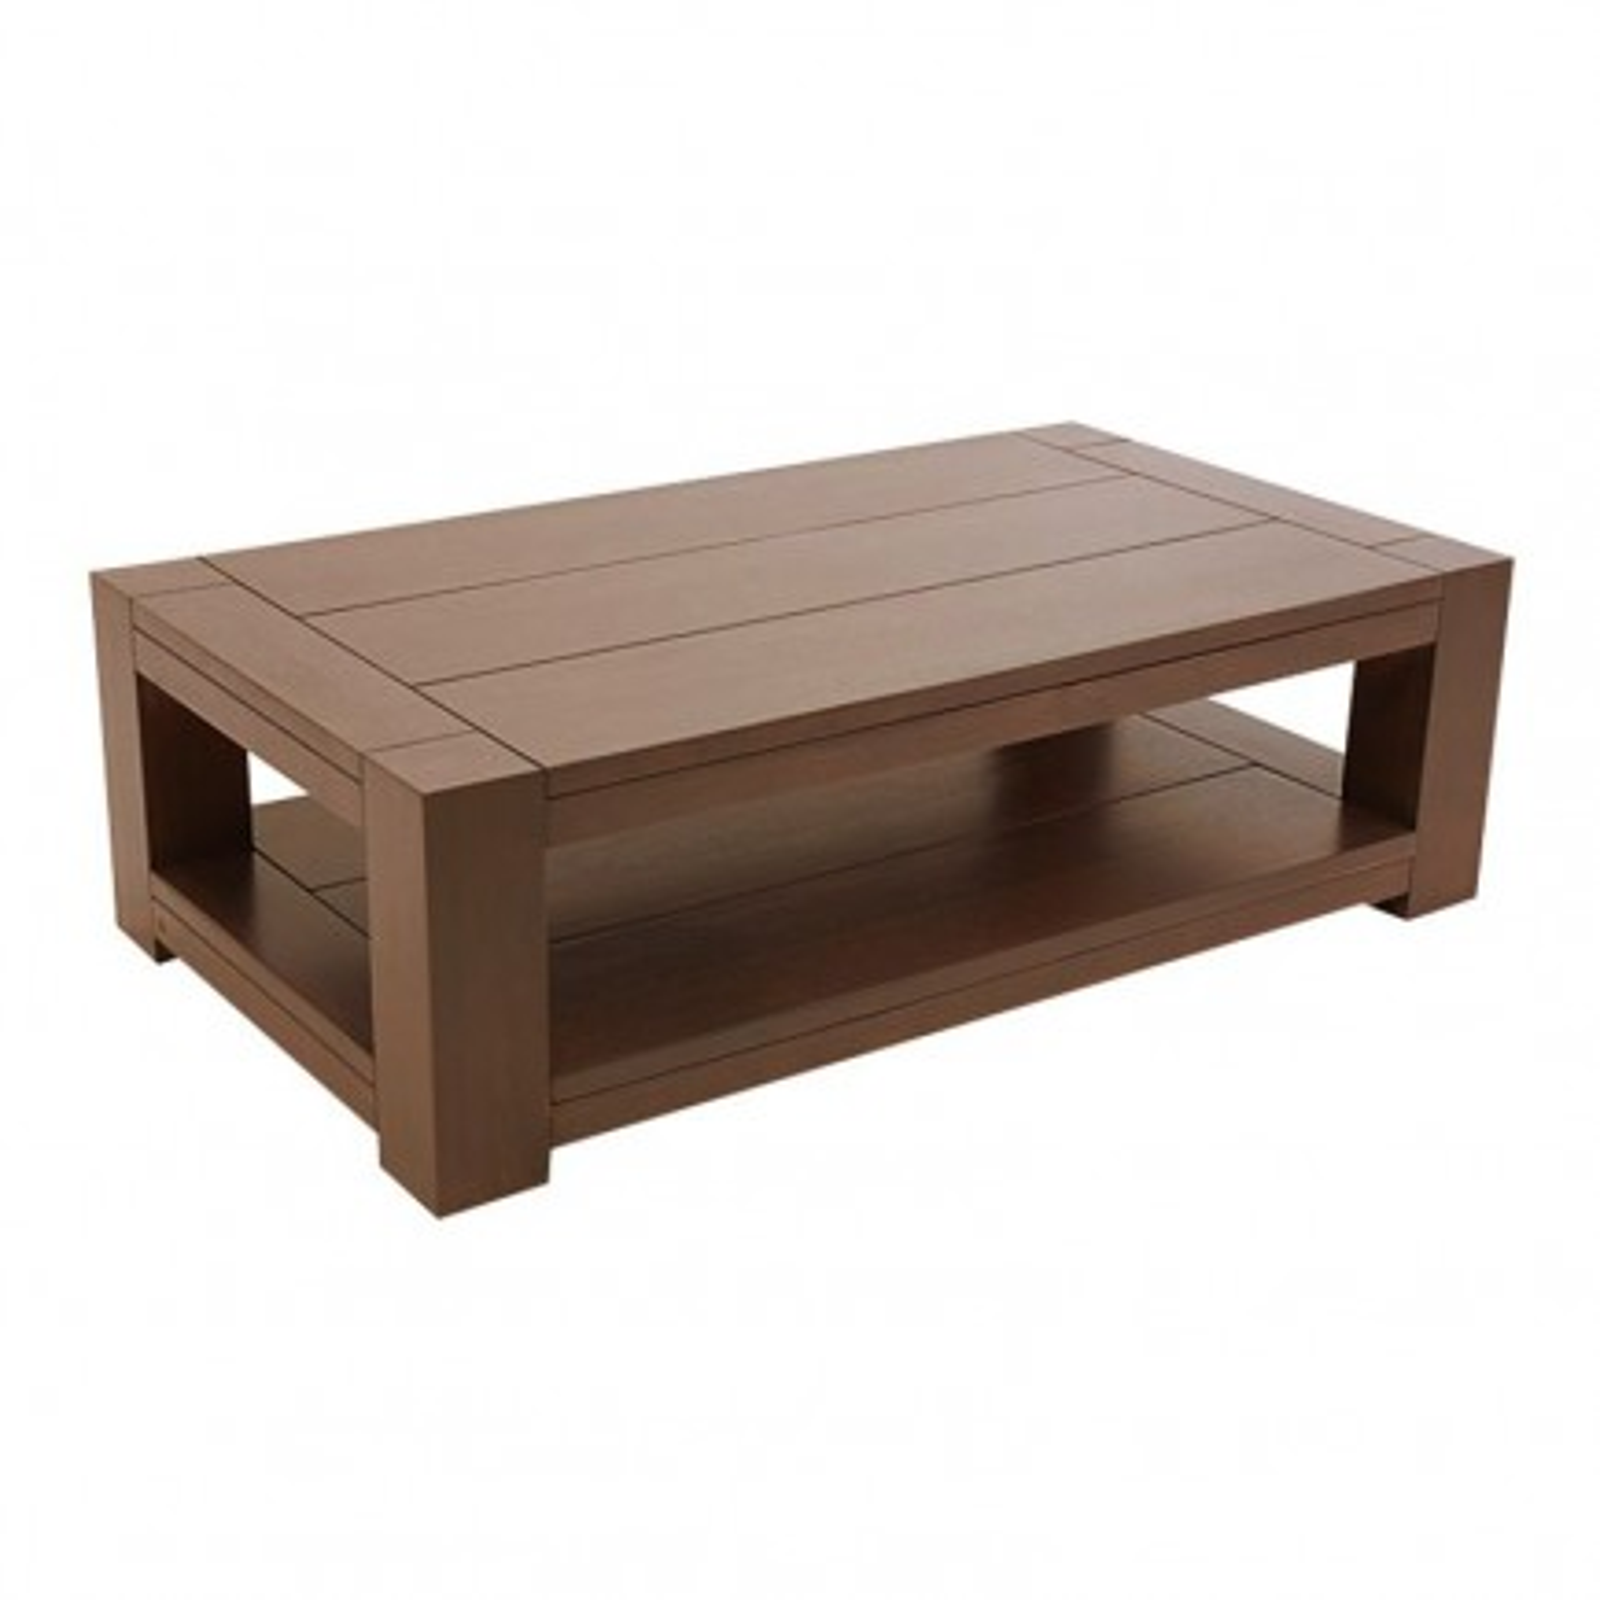 Table basse rectangulaire design : vente de meubles contemporains Moka